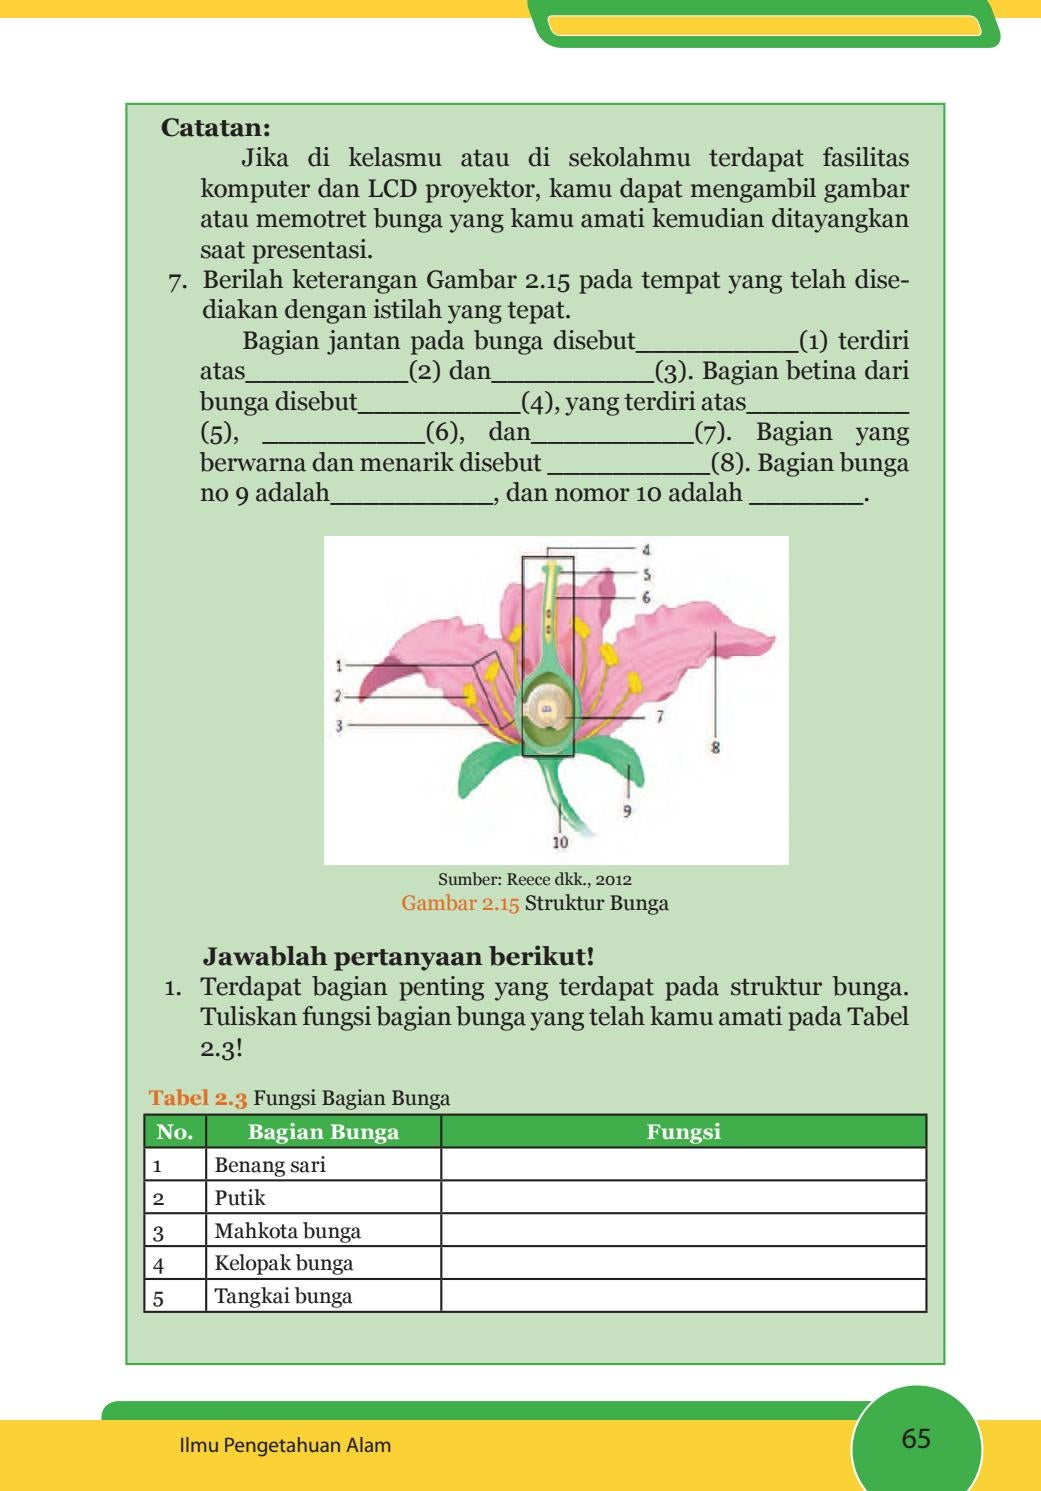 Struktur Bagian Bunga : struktur, bagian, bunga, Kelas, Pengetahuan, Siswa, Issuu